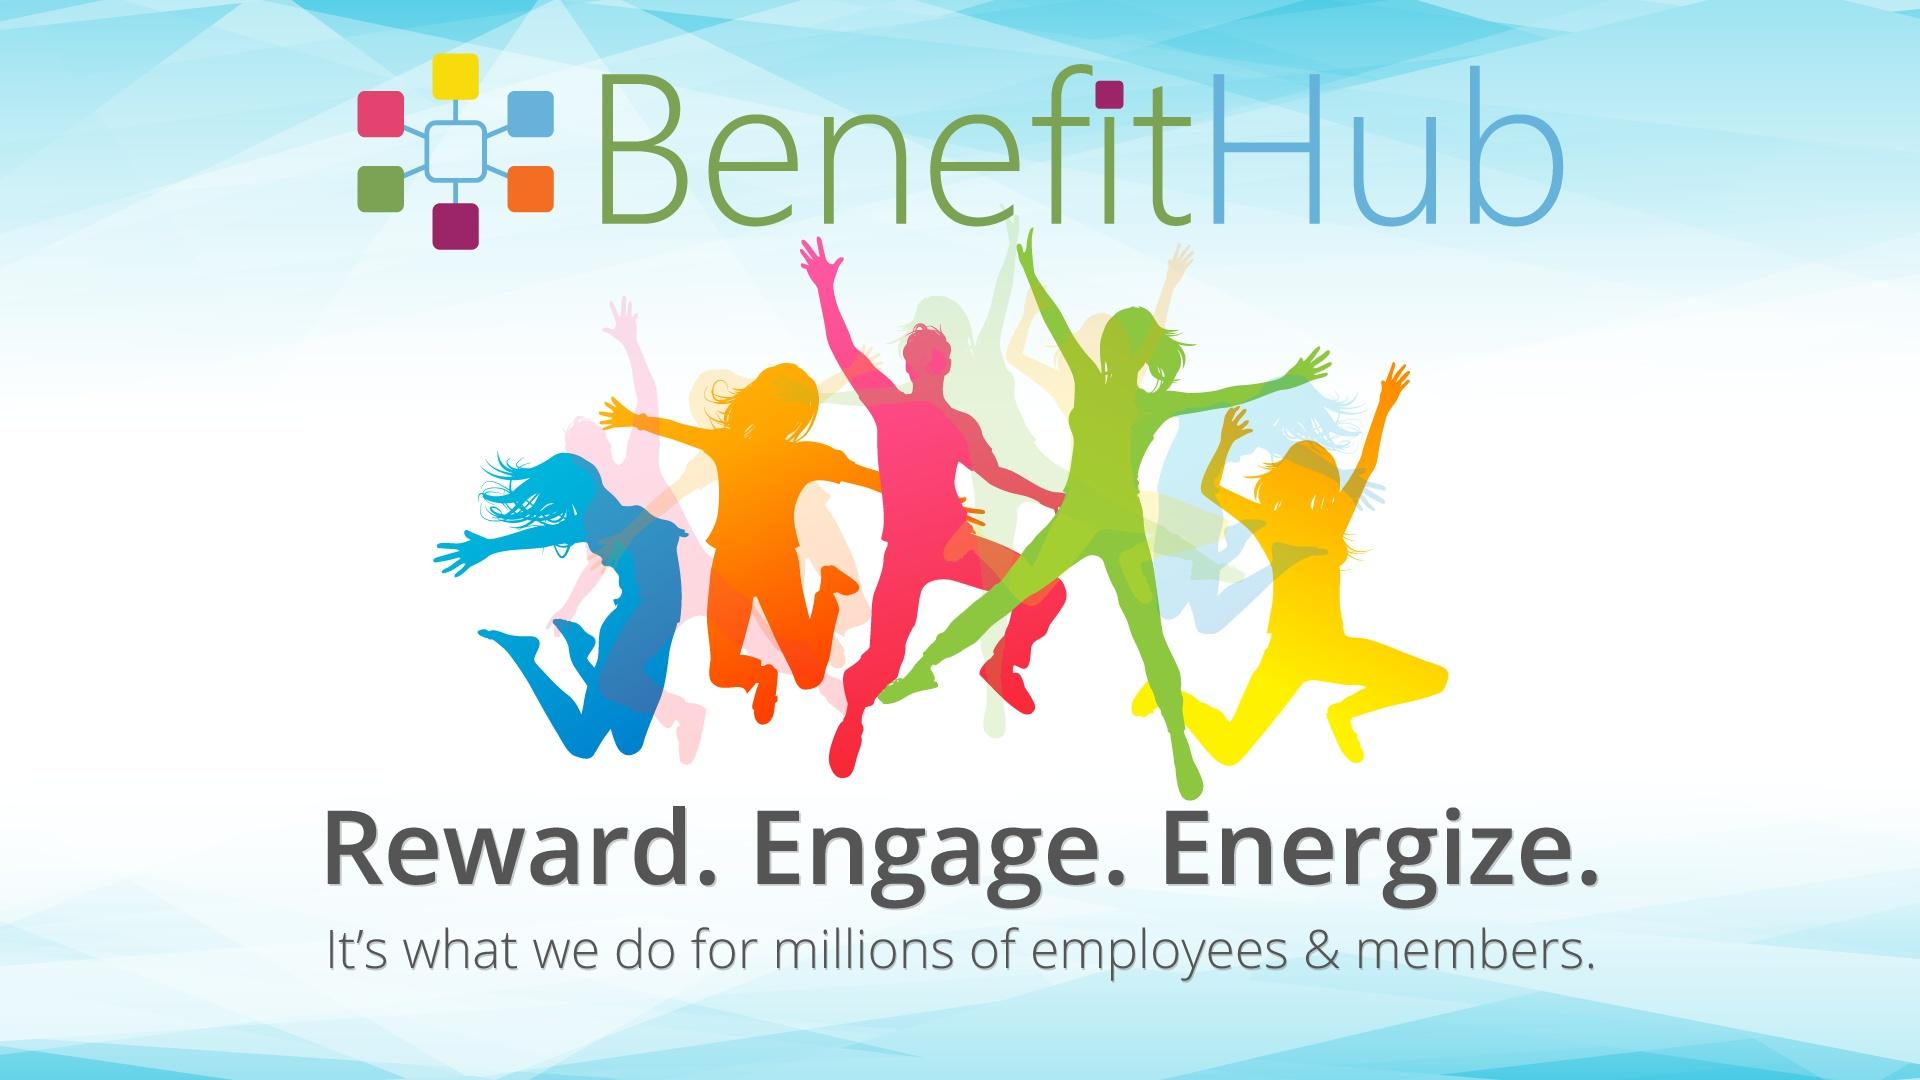 Golden Perks Benefits Hub Cdebfbddeefaebaeaded